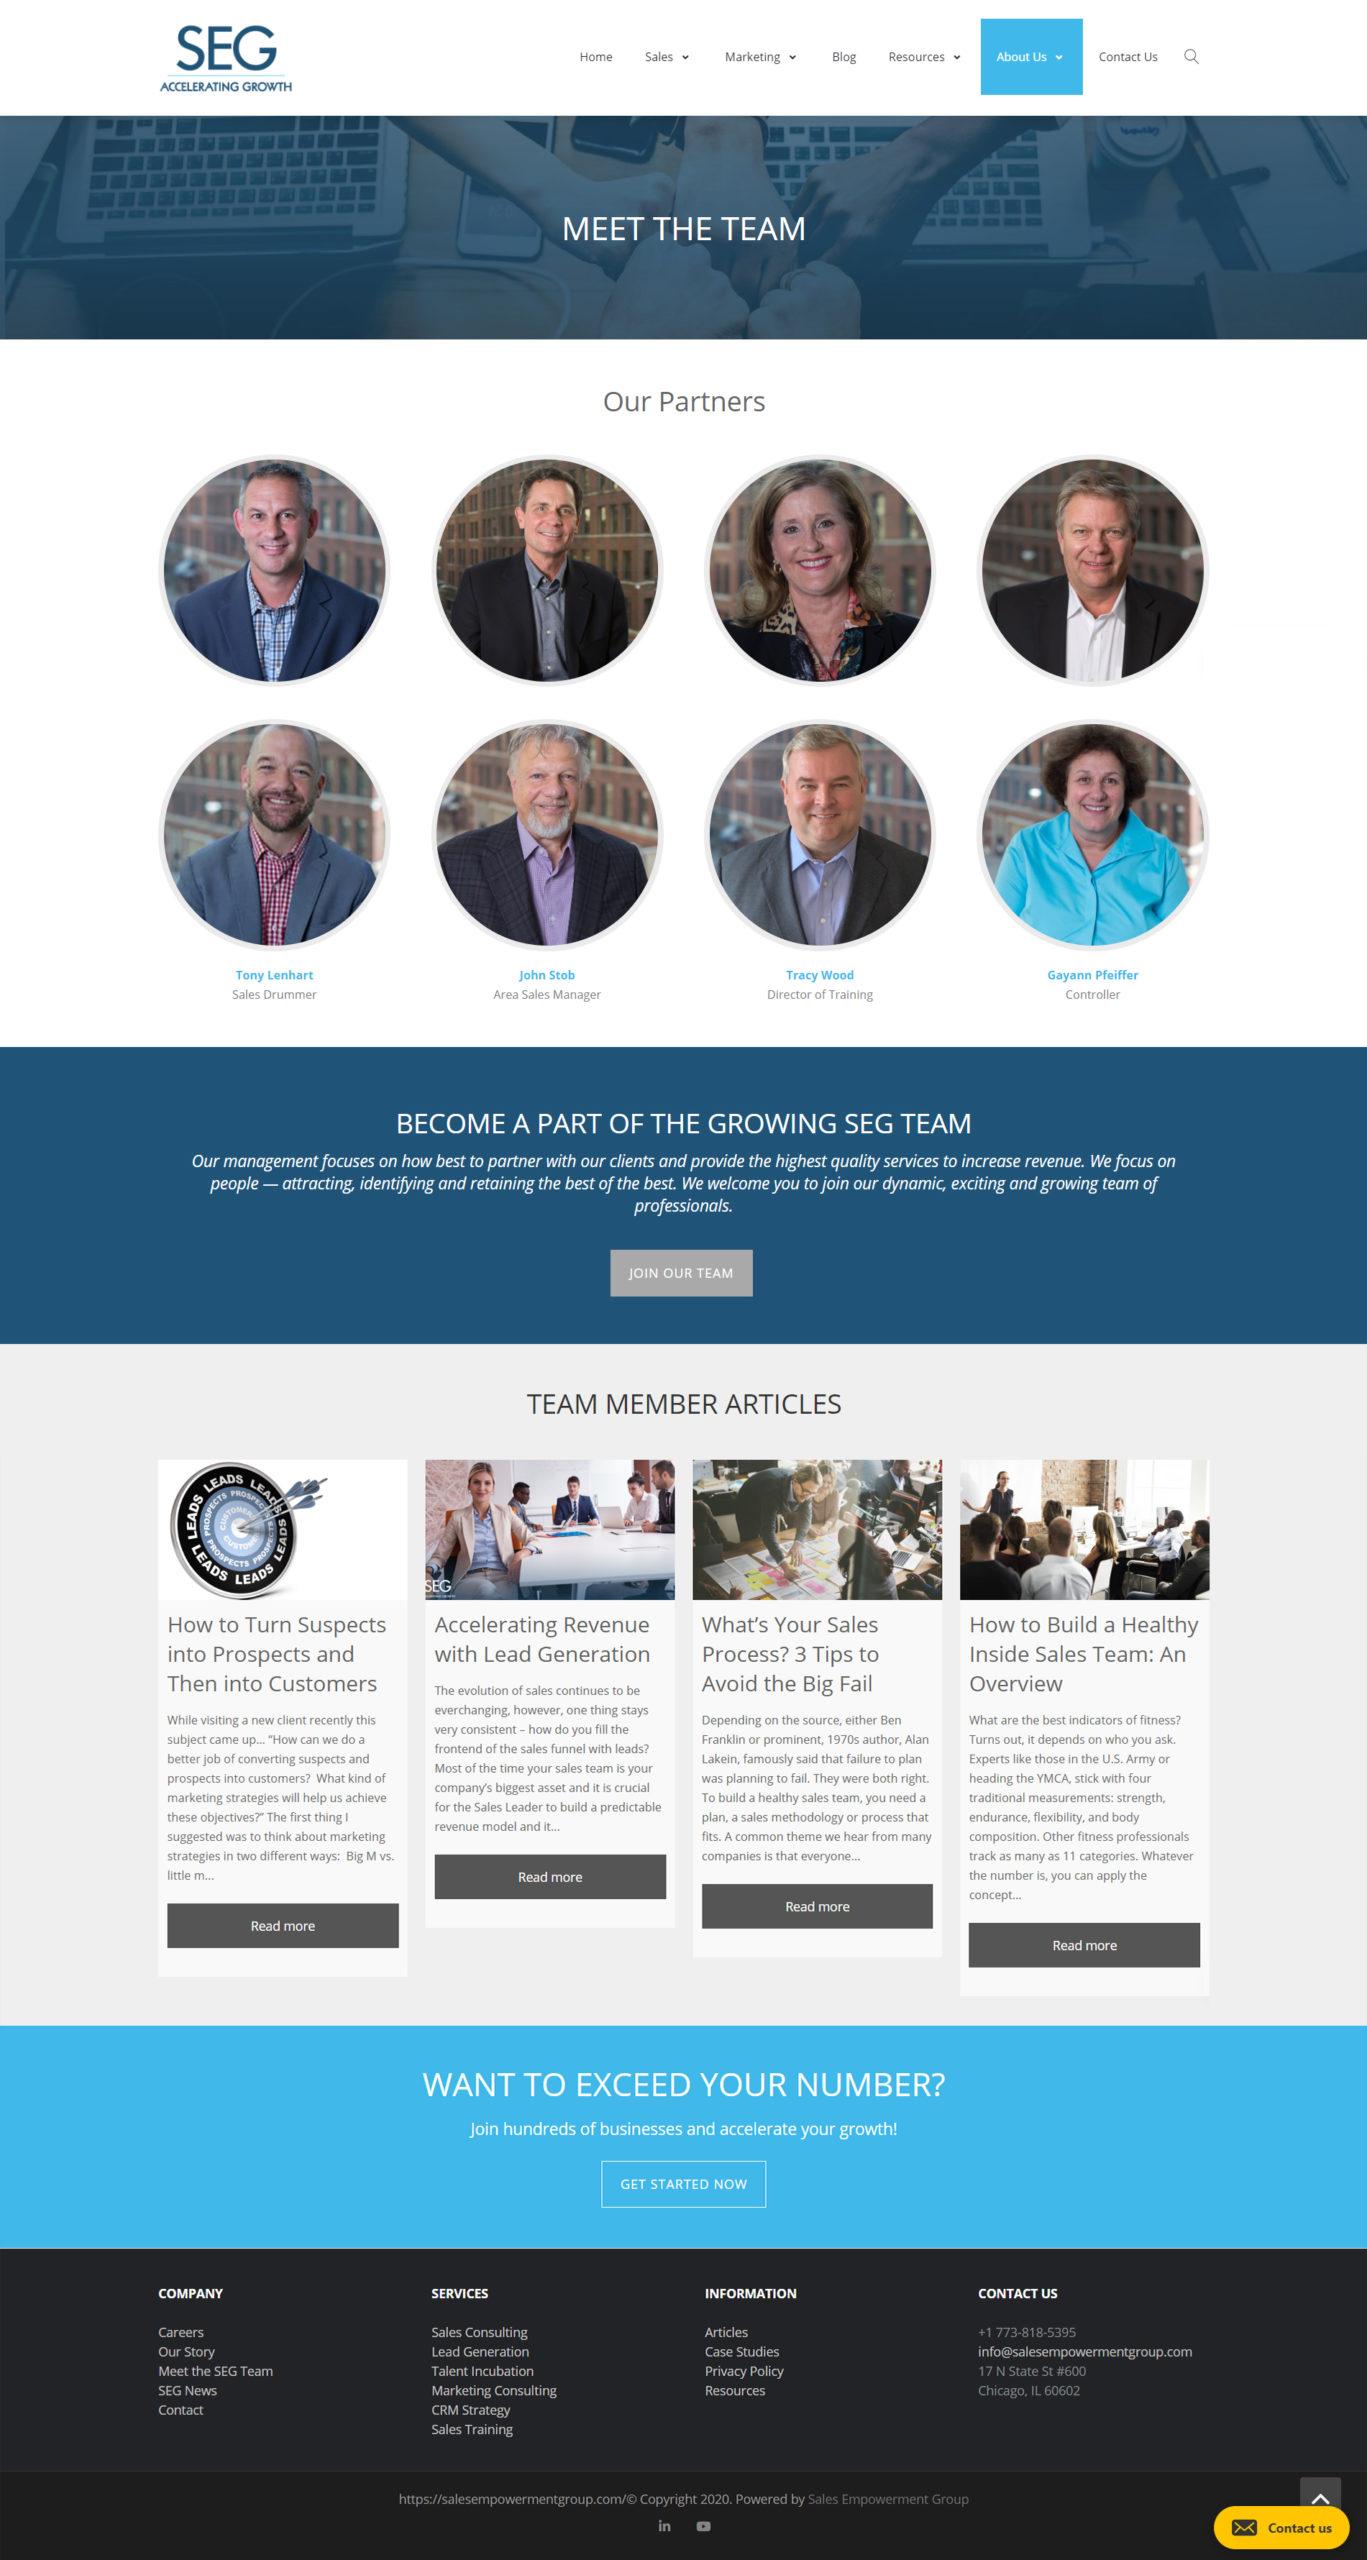 Screenshot of the SEG web page Meet the Team